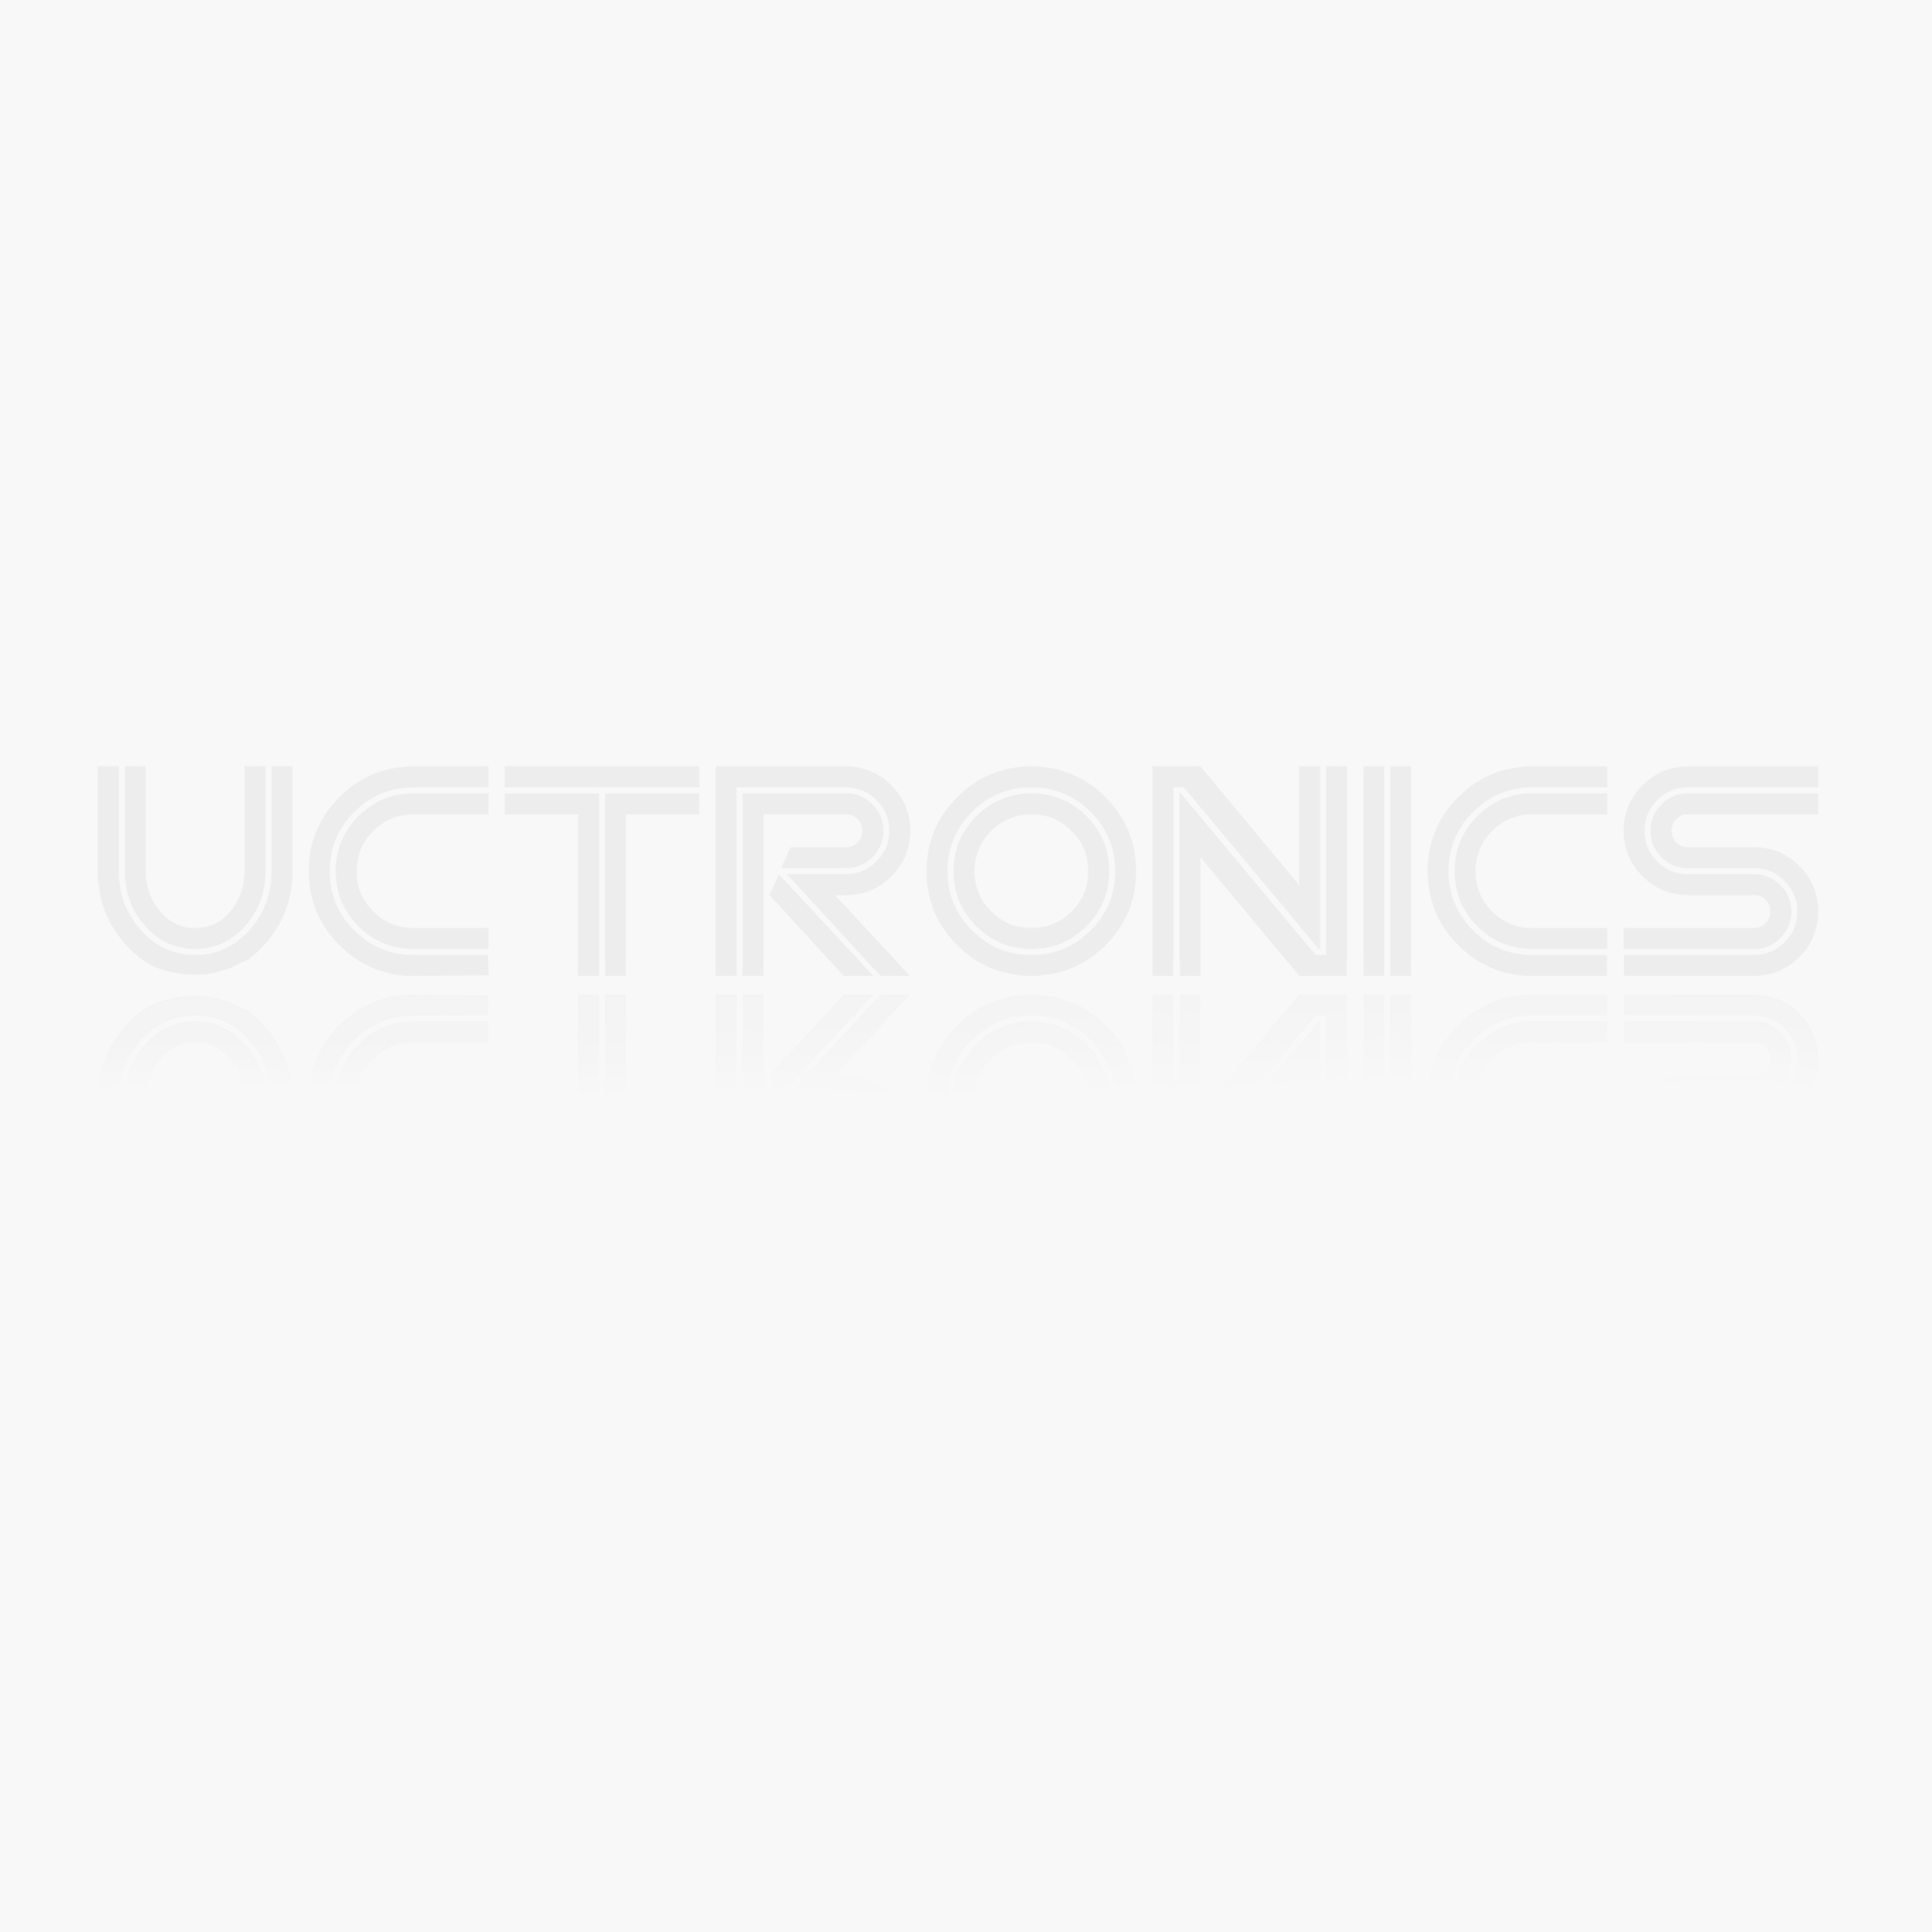 C8T6 STM32 STM32F103C8T6 Mininum Systerm Development Board